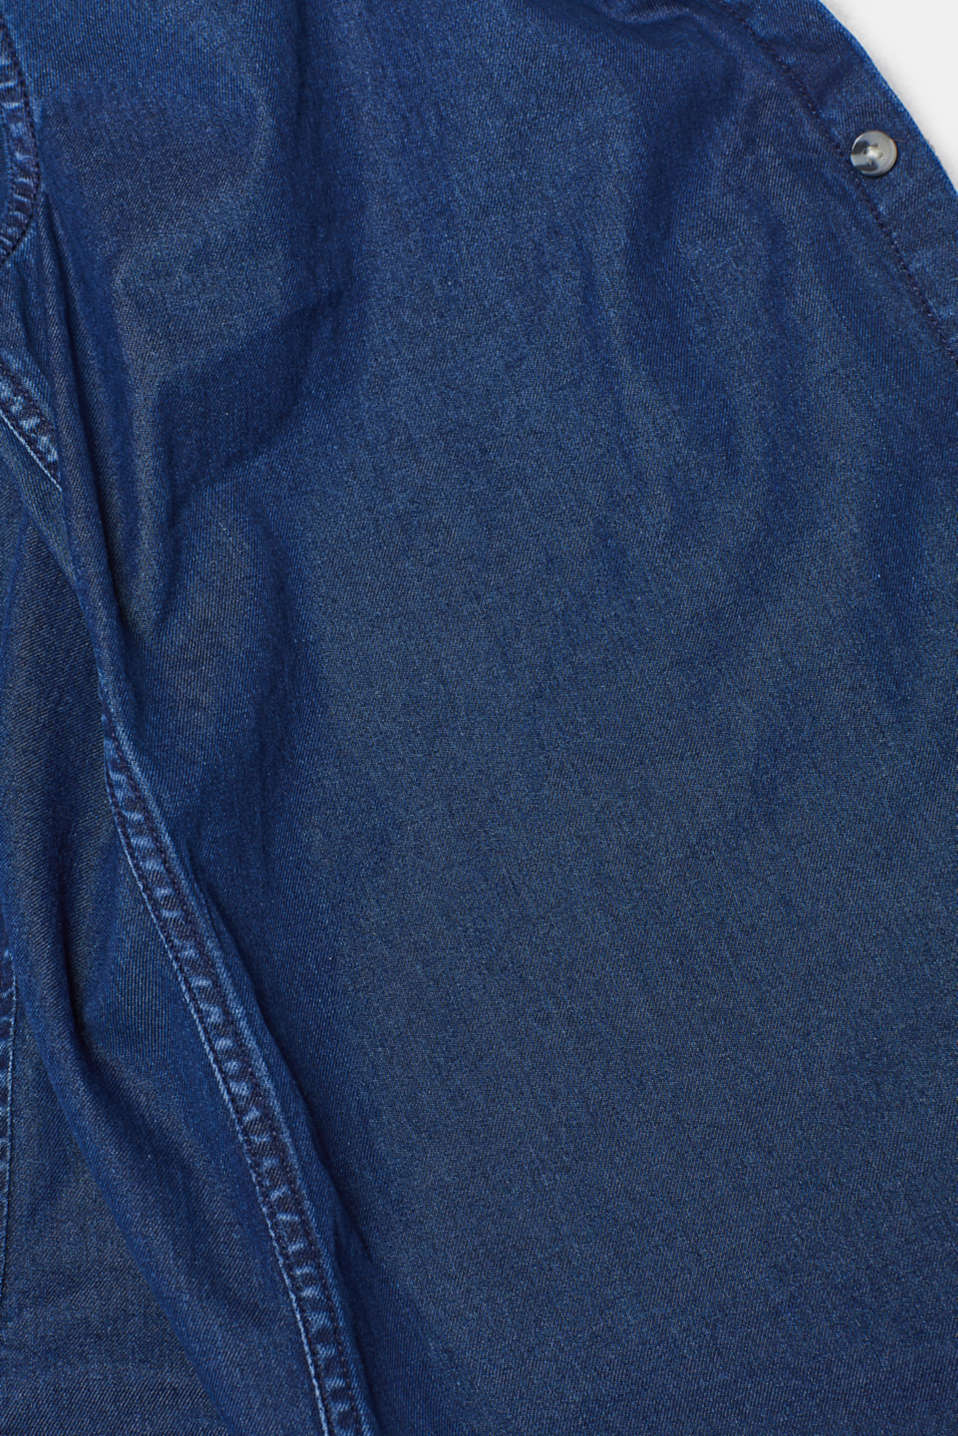 Denim shirt in 100% cotton, BLUE MEDIUM WASH, detail image number 4